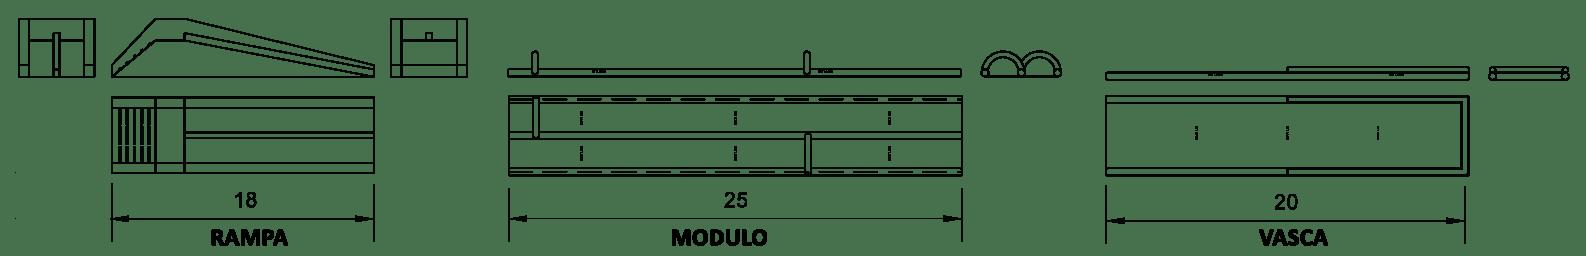 City Slide moduli gonfiabili